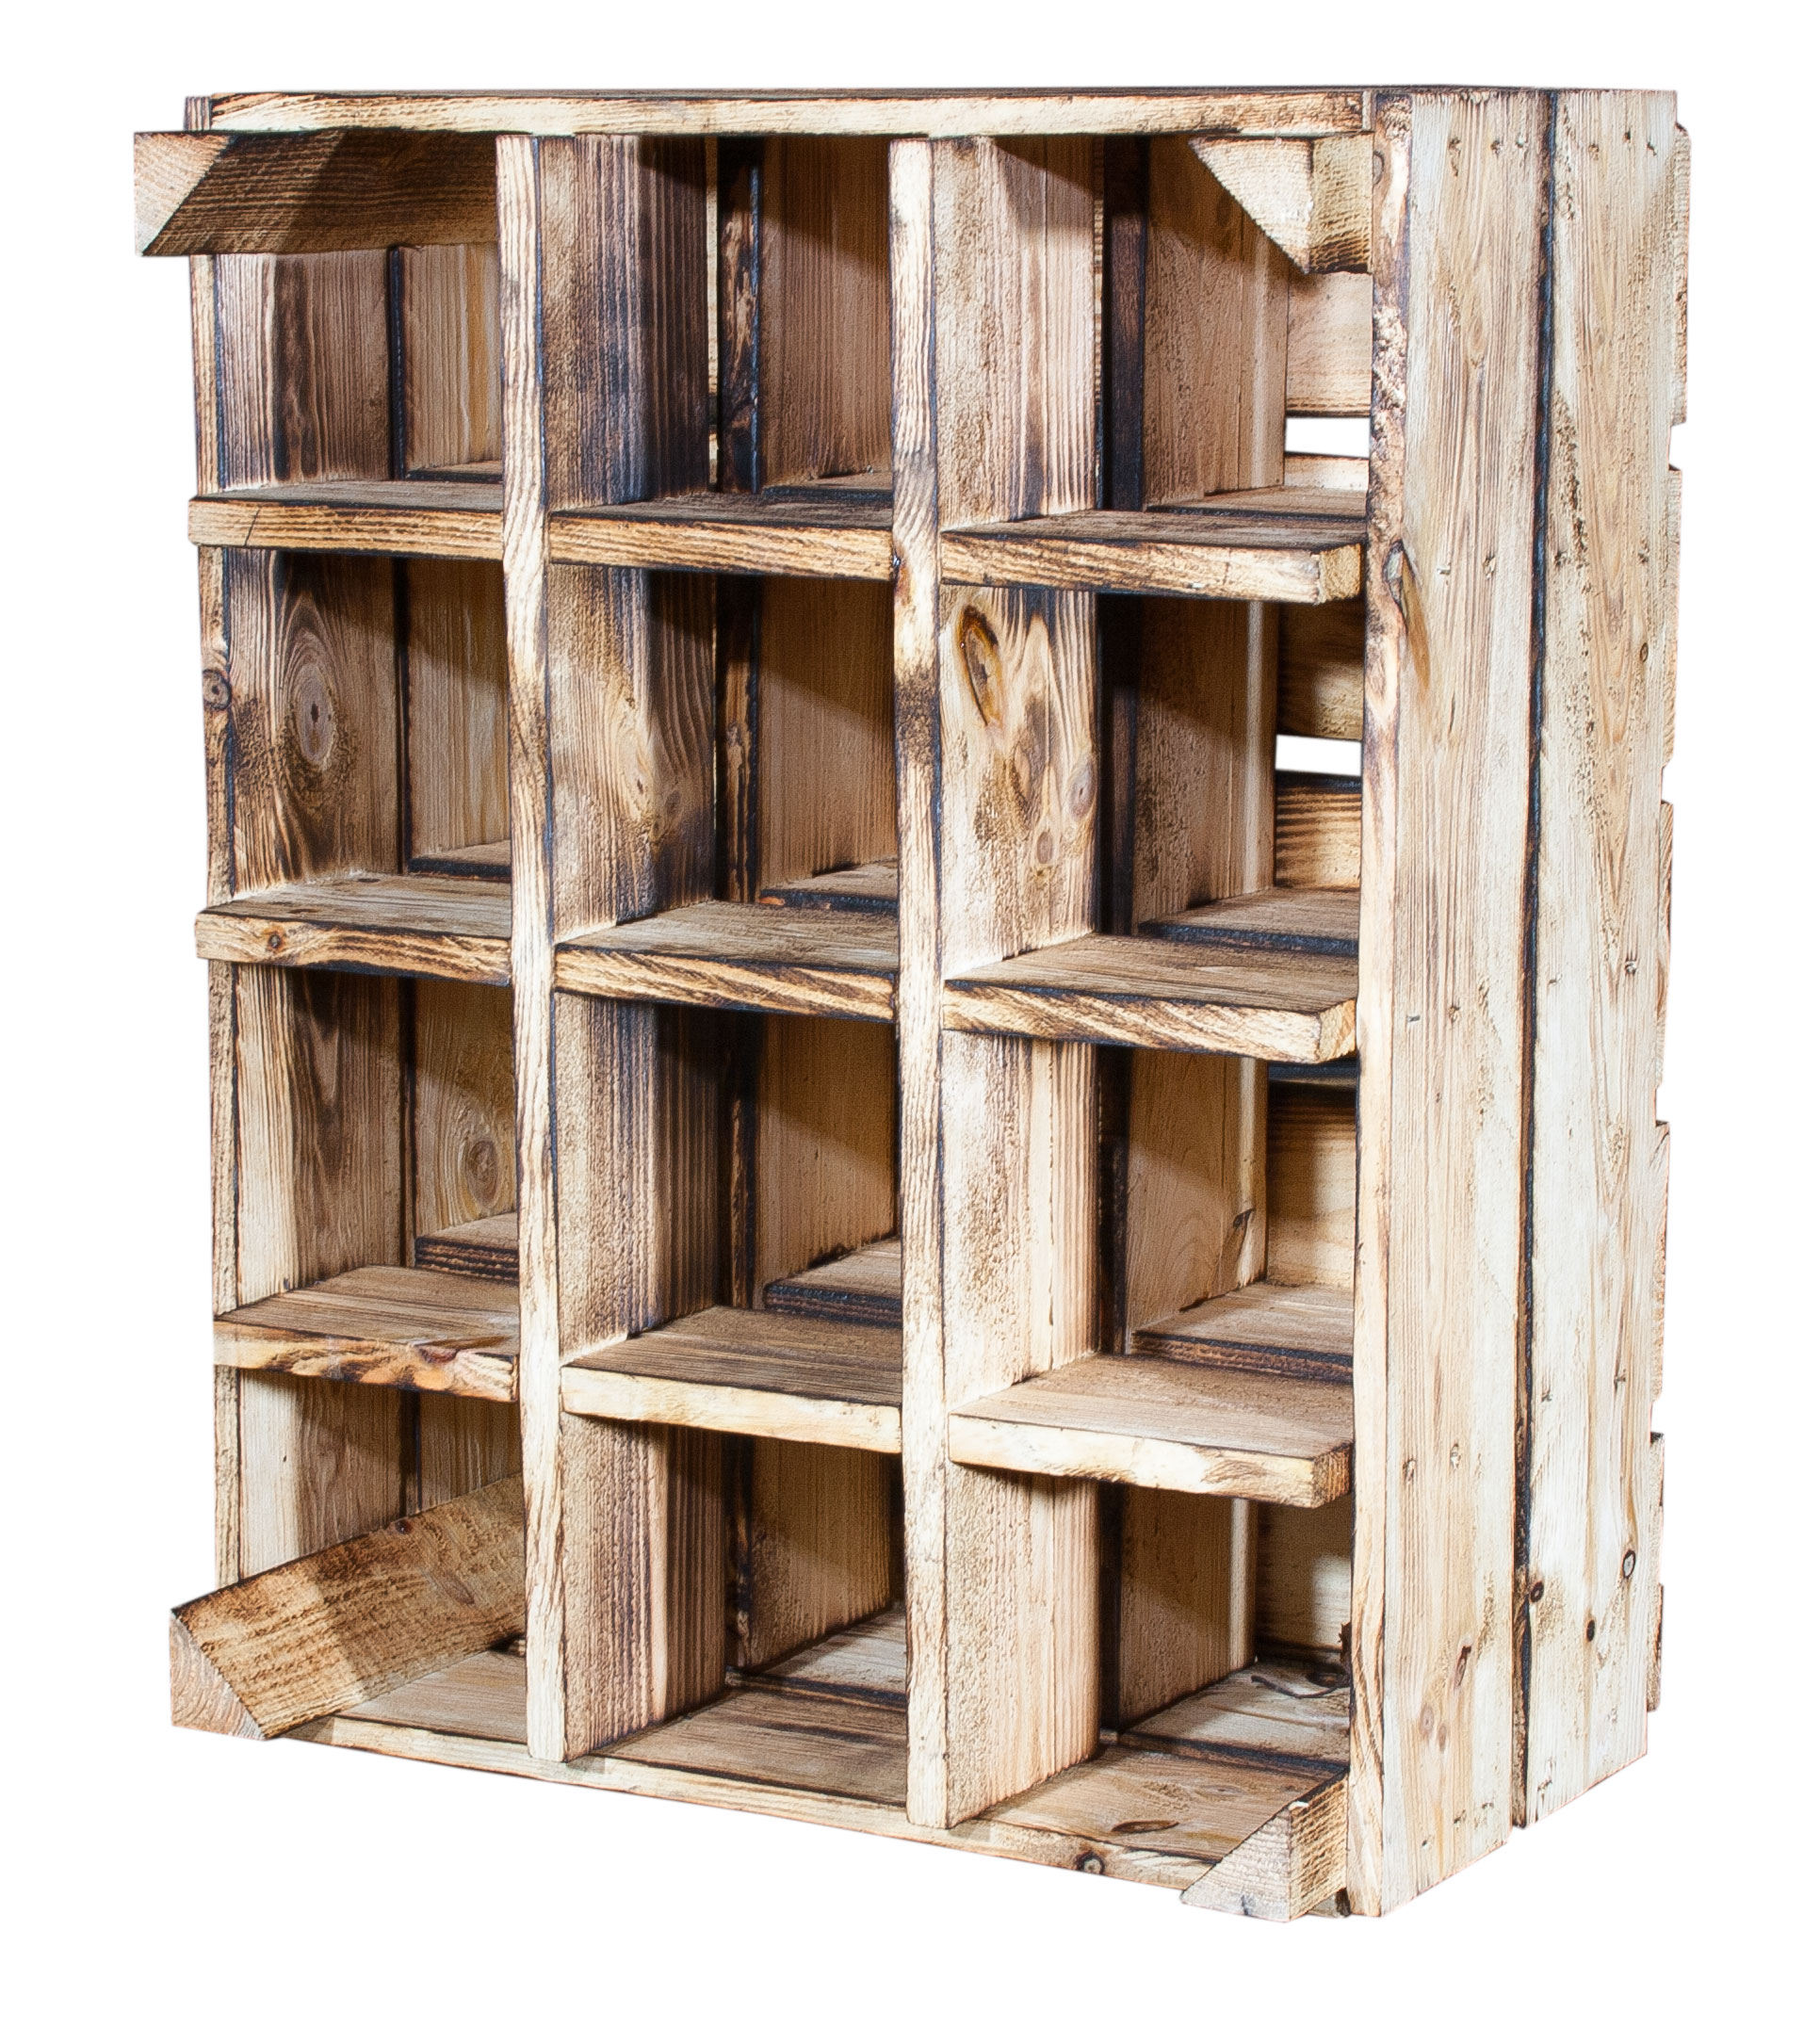 geflammte kisten weinflaschenregal geflammt 50x40x23cm. Black Bedroom Furniture Sets. Home Design Ideas